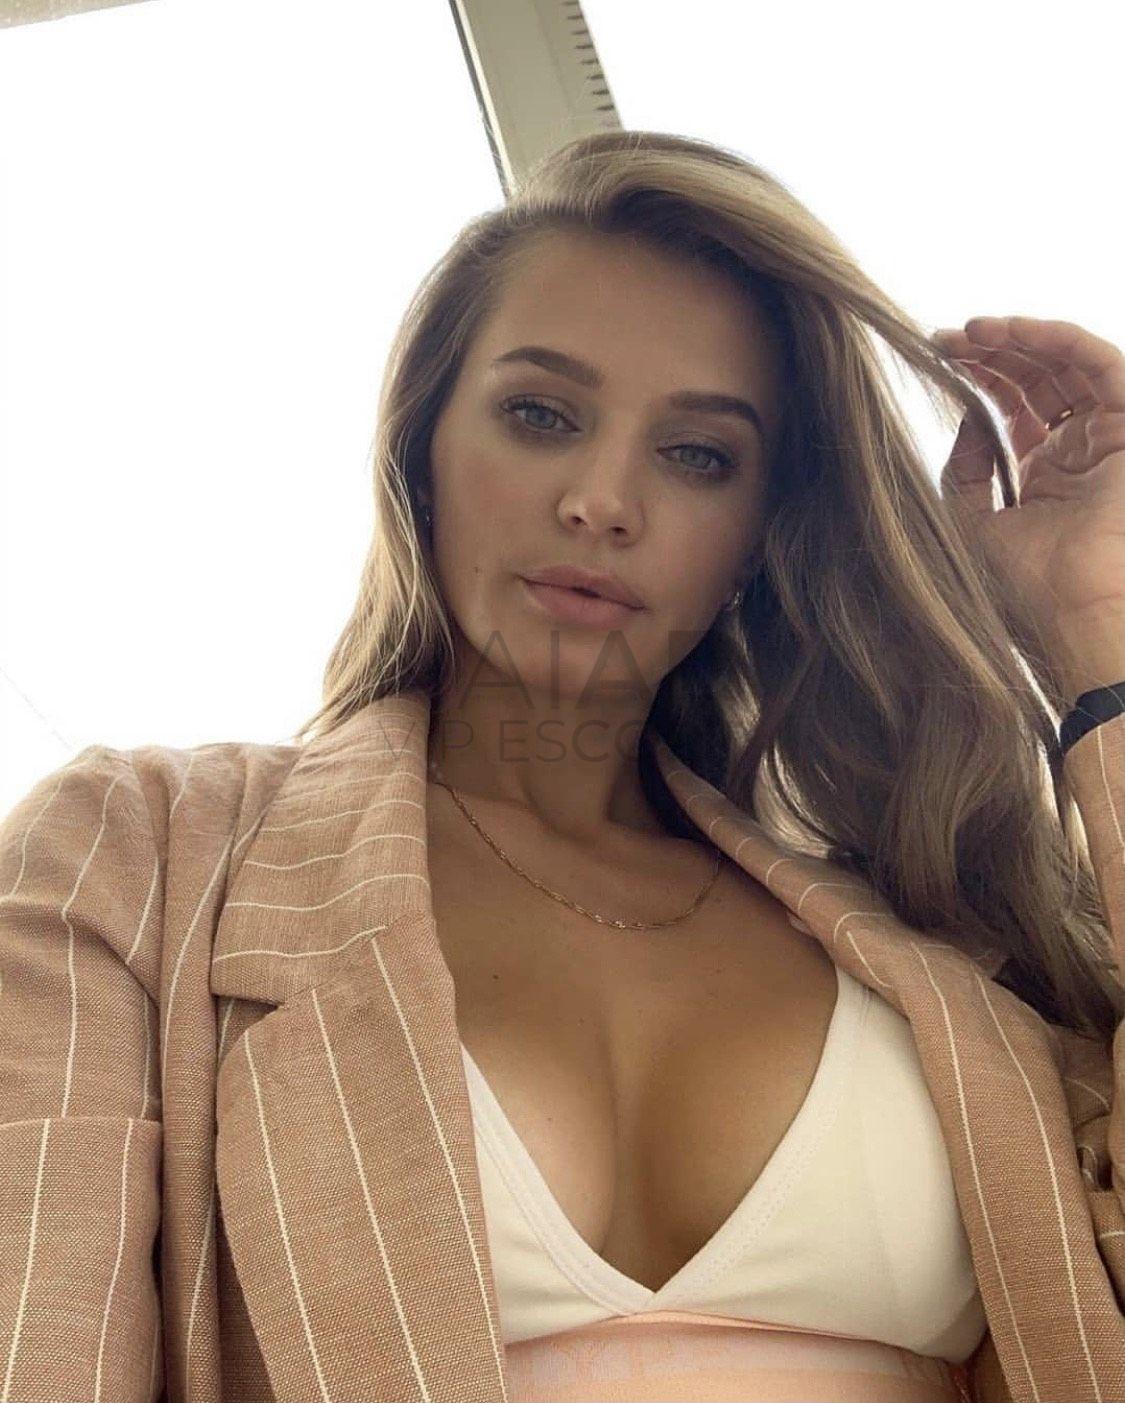 Photo of Caitlyn on Naiad vip escort service in Paris